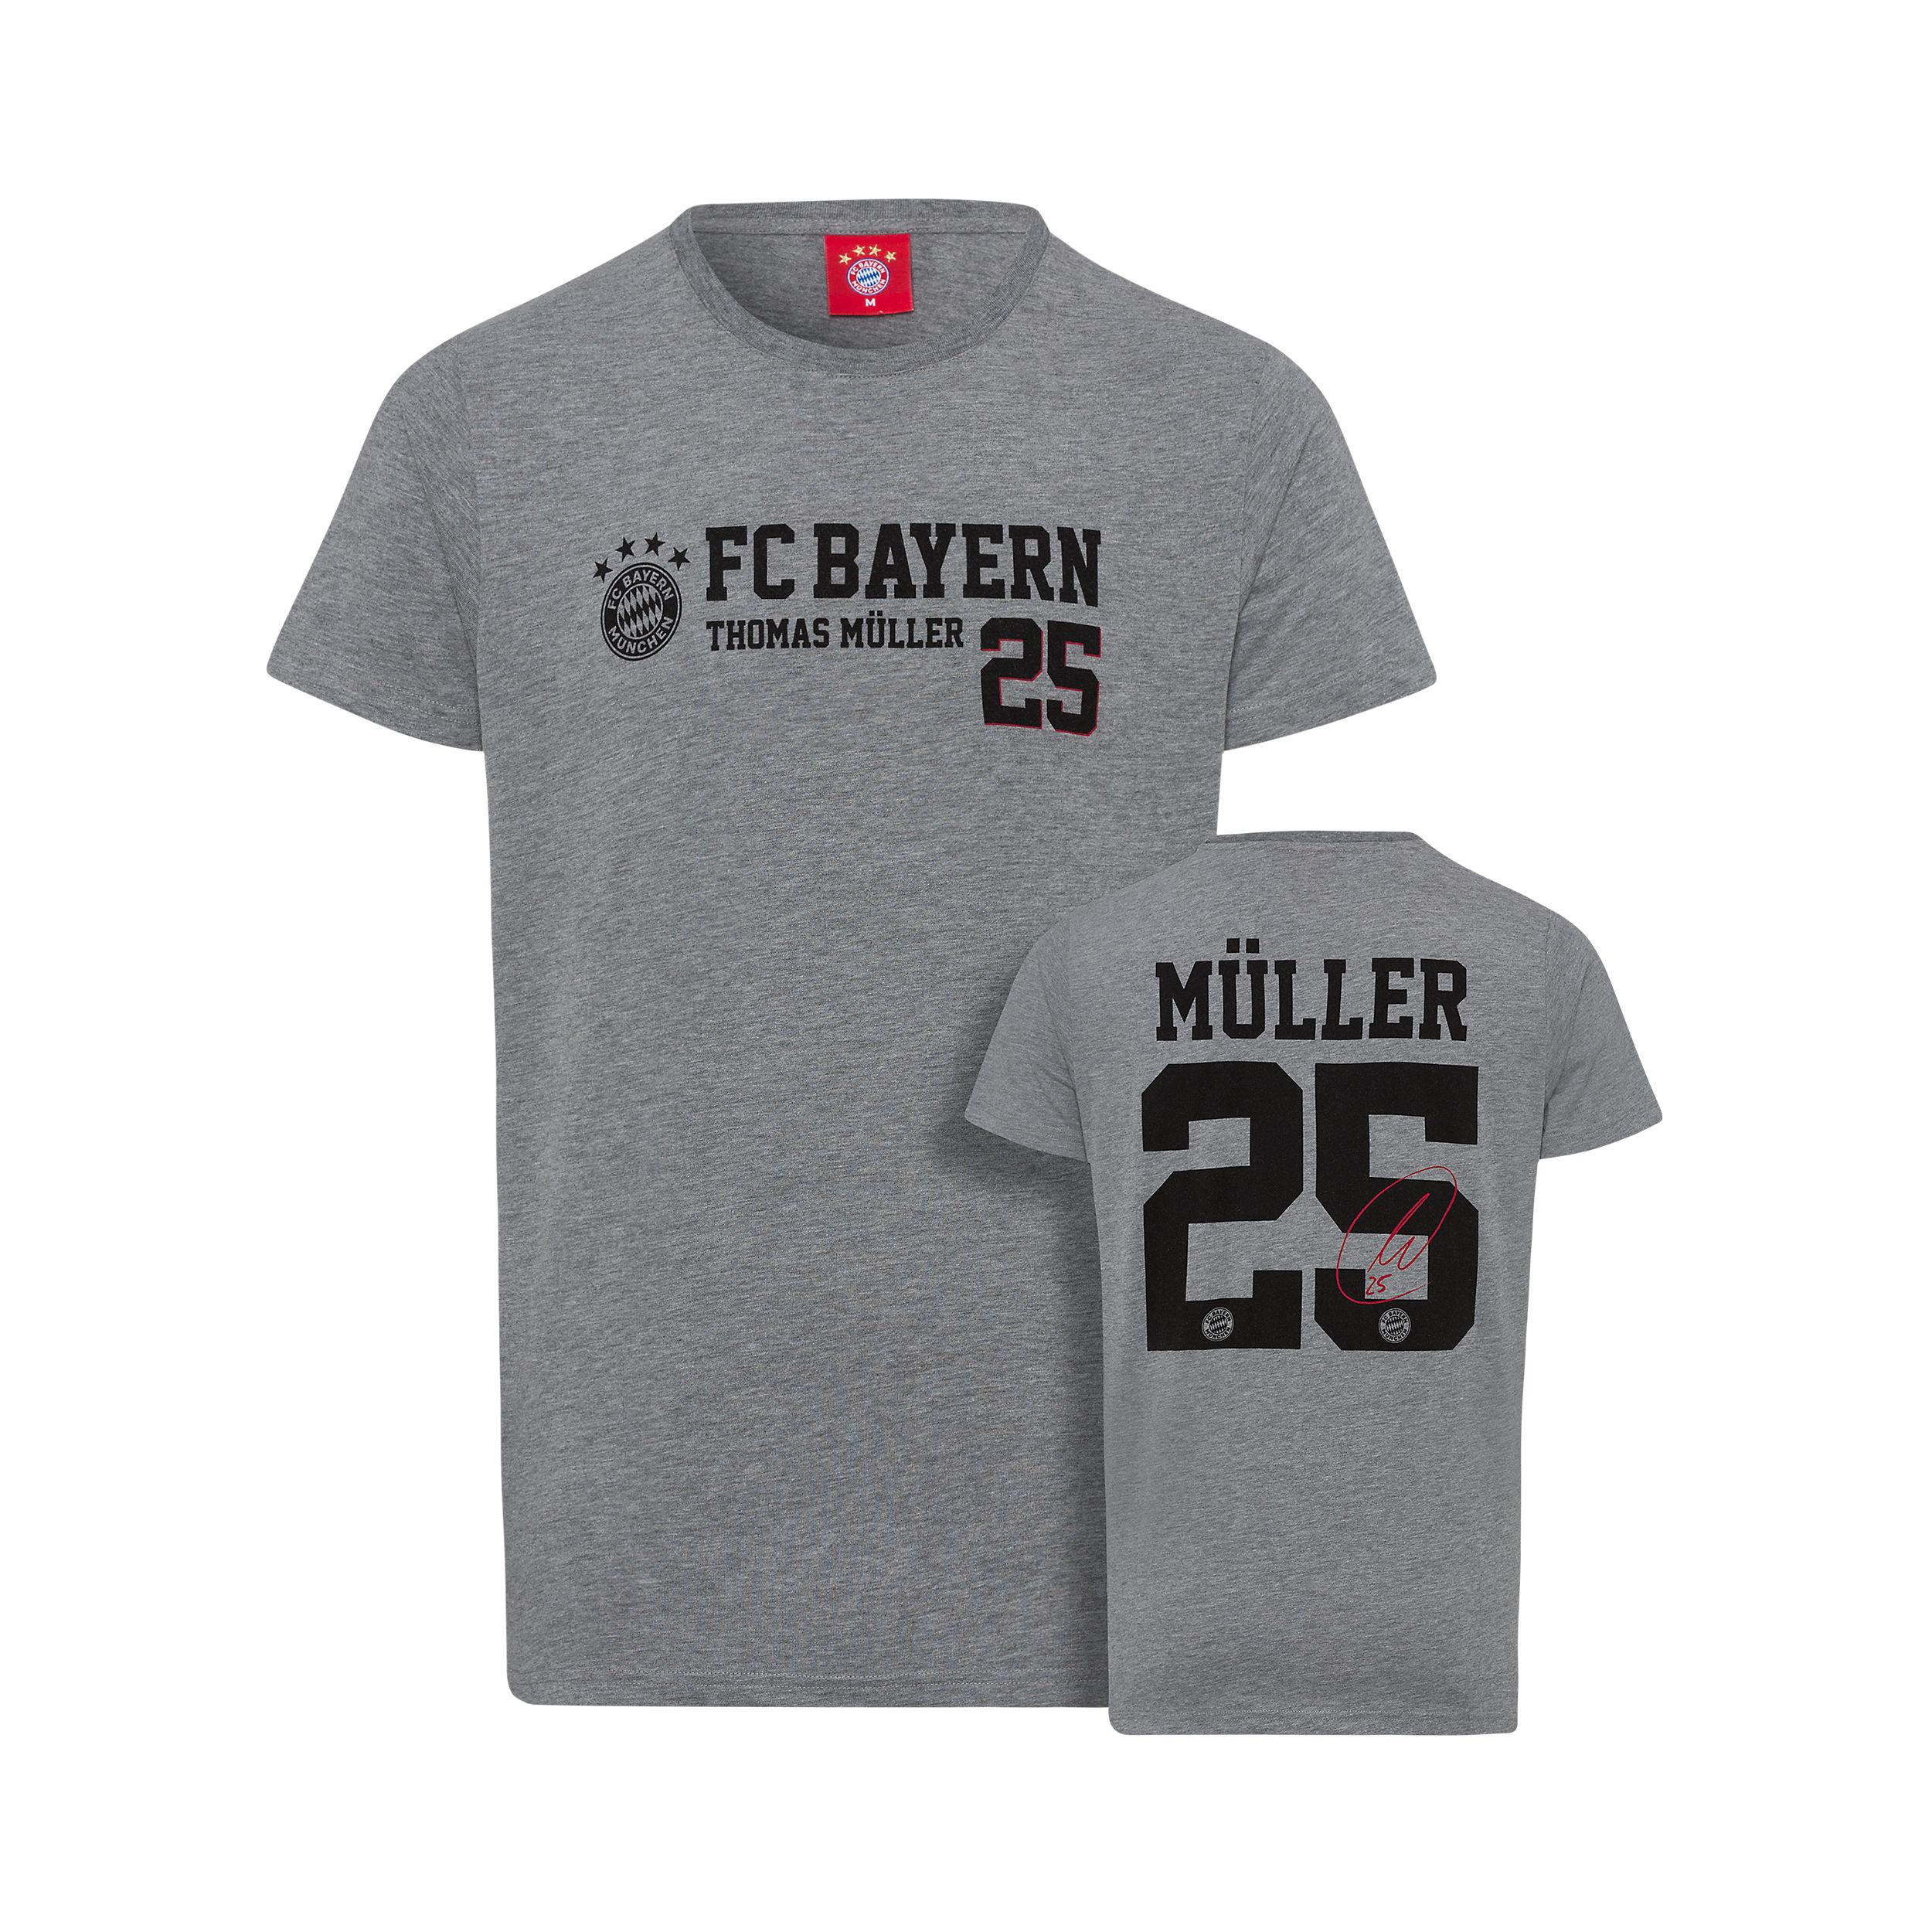 Kinder T-Shirt Müller Thomas Müller